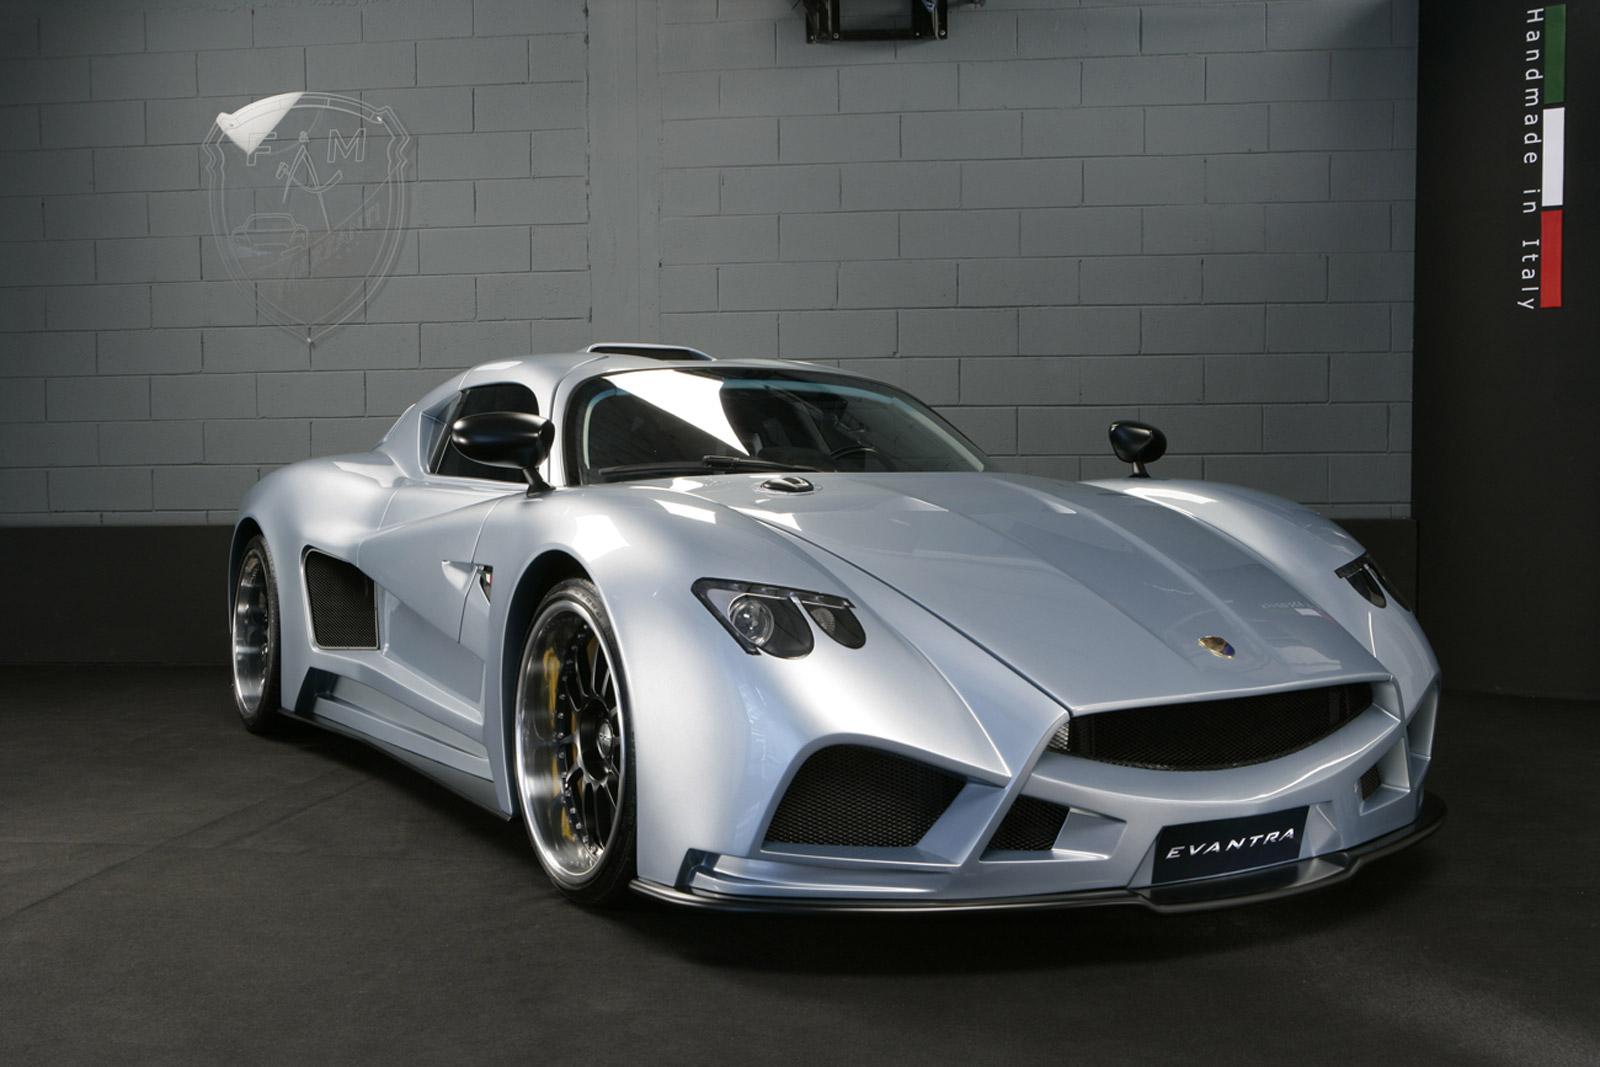 Mazzanti Evantra V8 Supercar Debuts At 2013 Top Marques Monaco